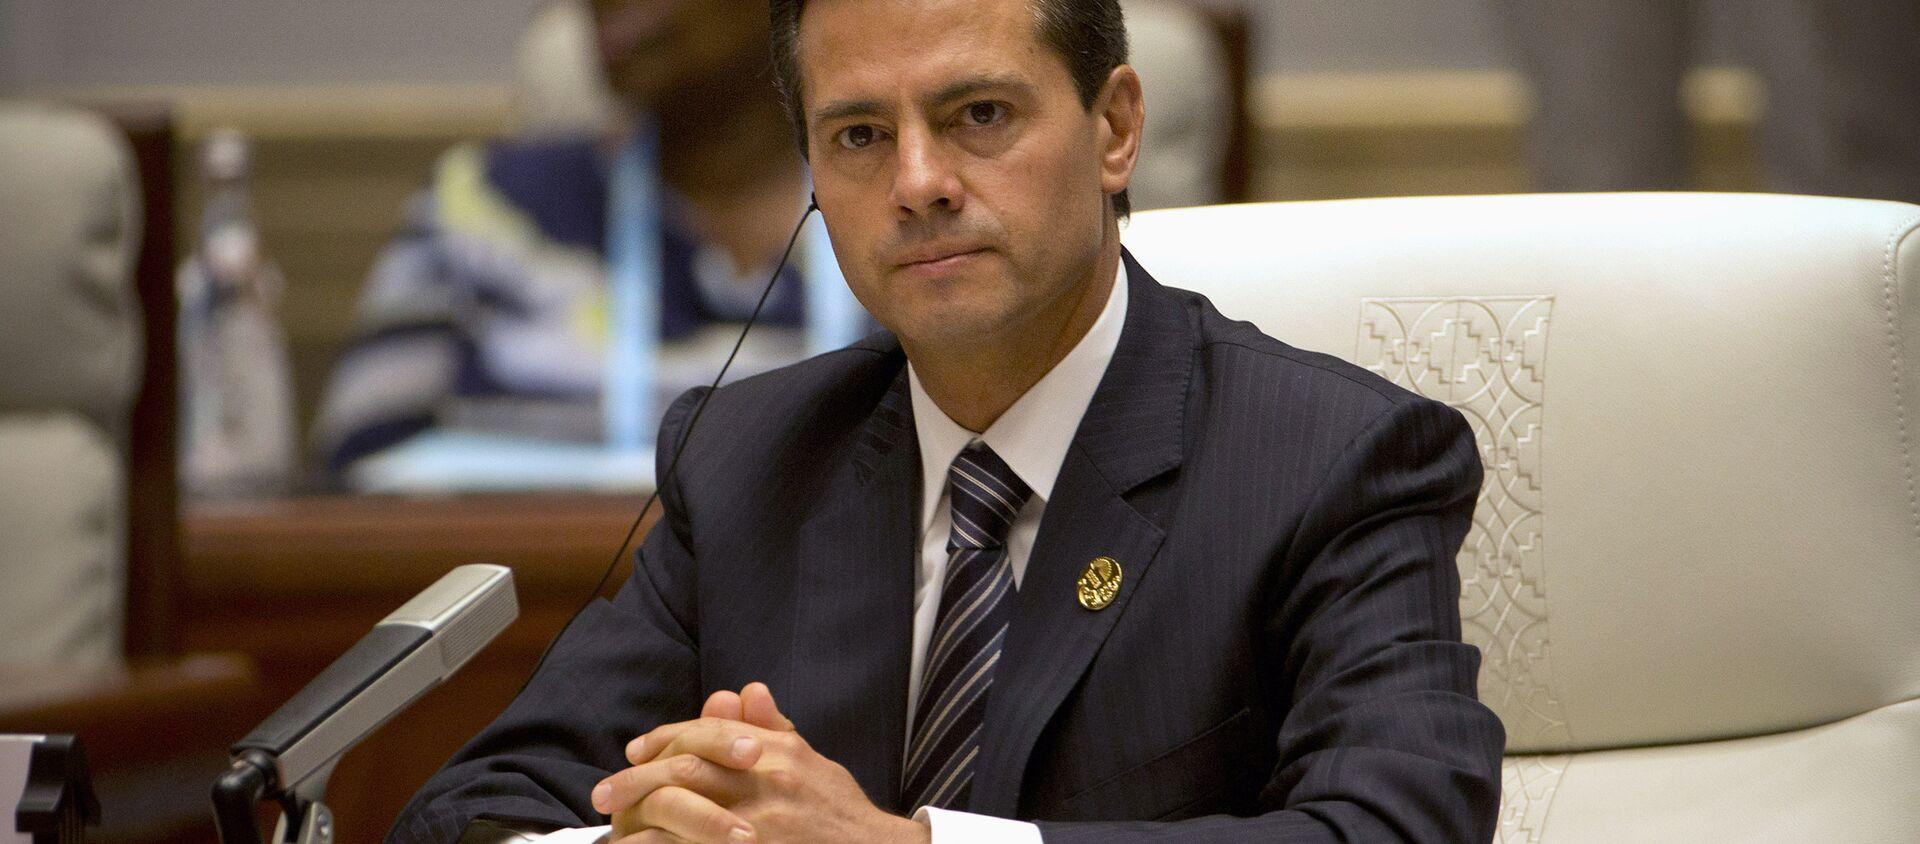 Enrique Peña Nieto, presidente de México, en la cumbre de BRICS - Sputnik Mundo, 1920, 12.11.2020